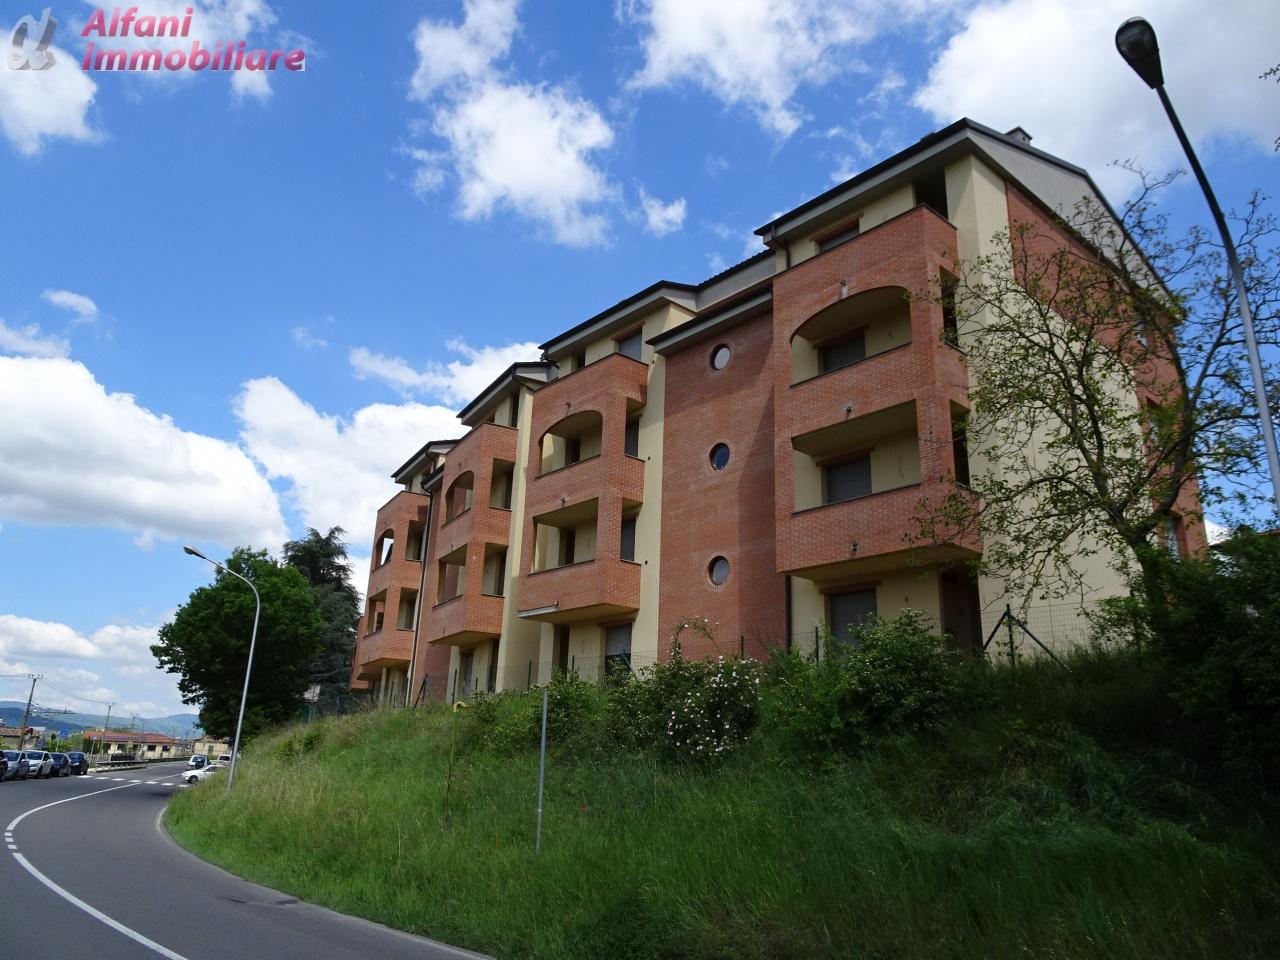 Appartamento trilocale in vendita a Bibbiena (AR)-2